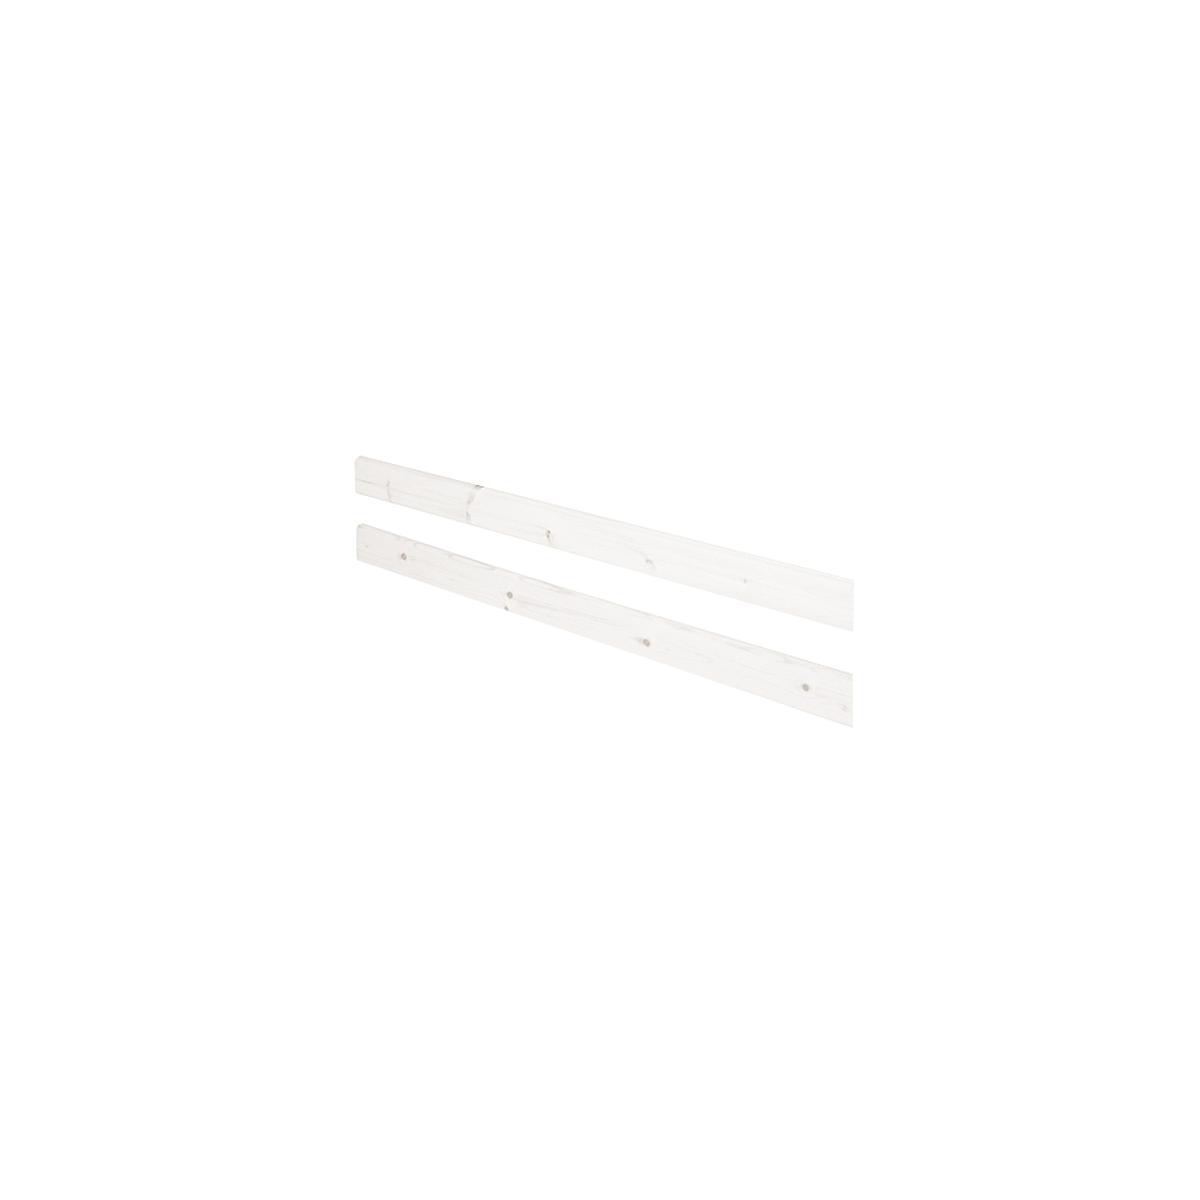 Barrera posterior Cama 190cm CLASSIC Flexa blanco cal